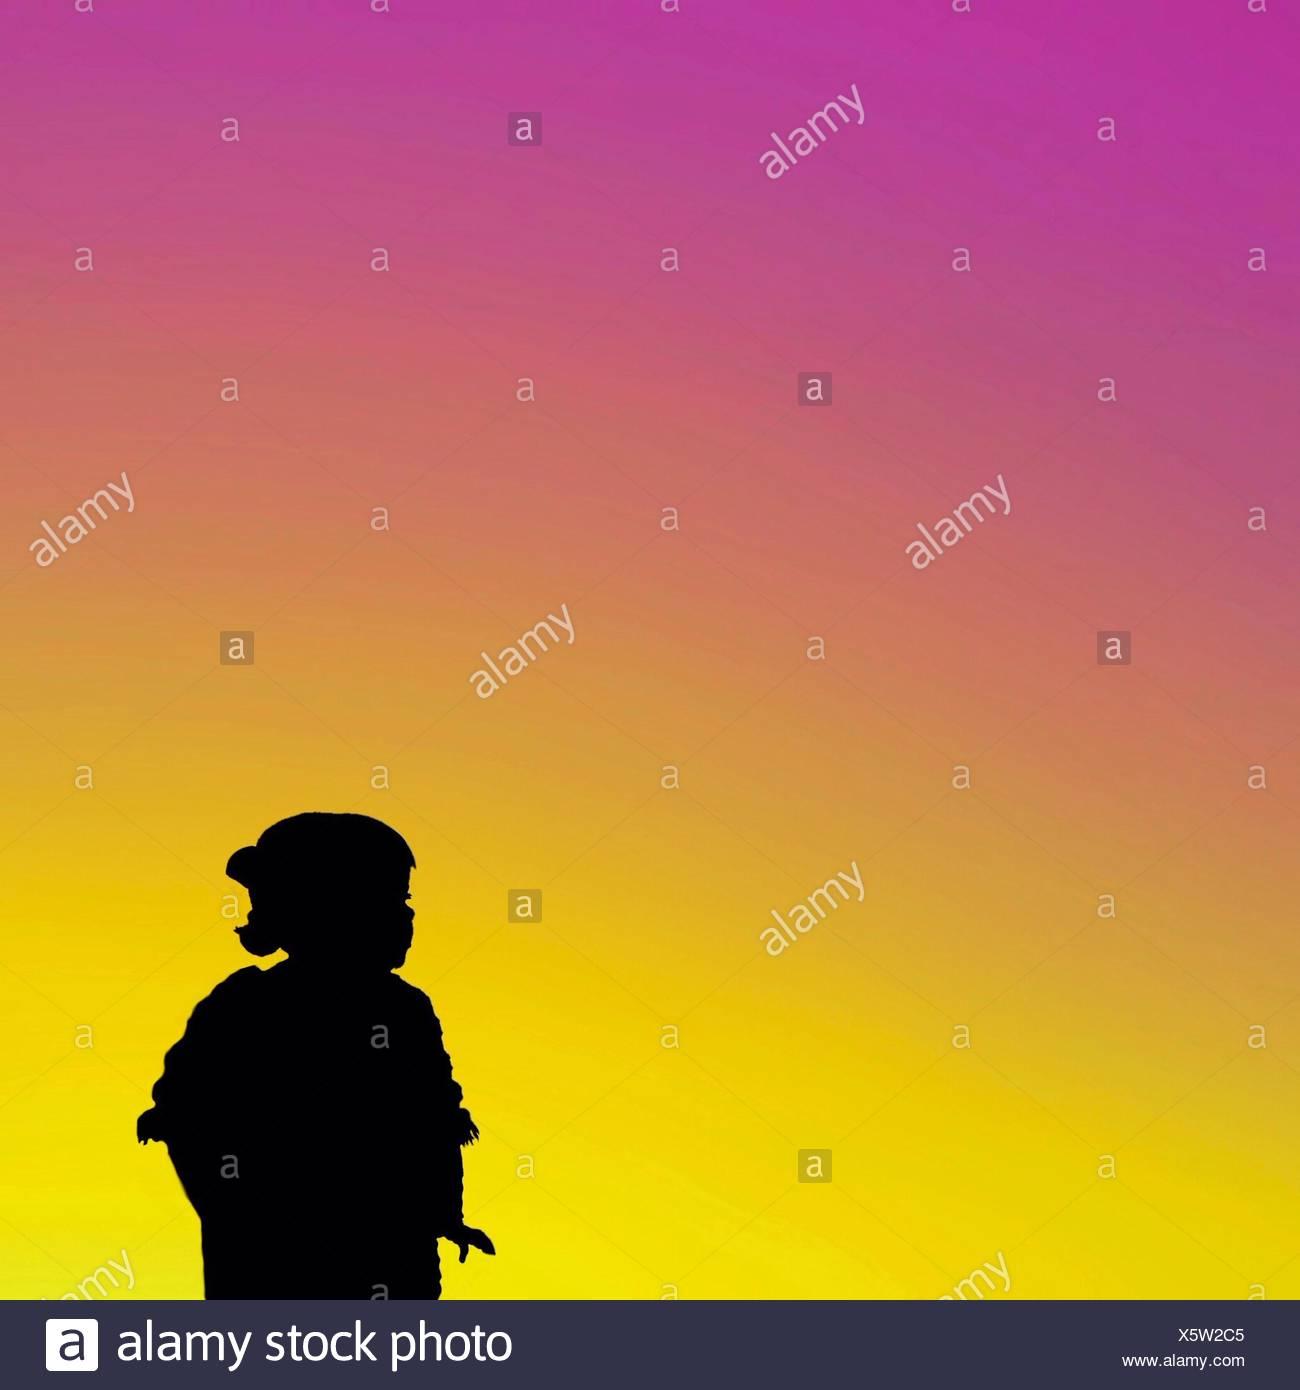 Fille Silhouette contre ciel dramatique Photo Stock